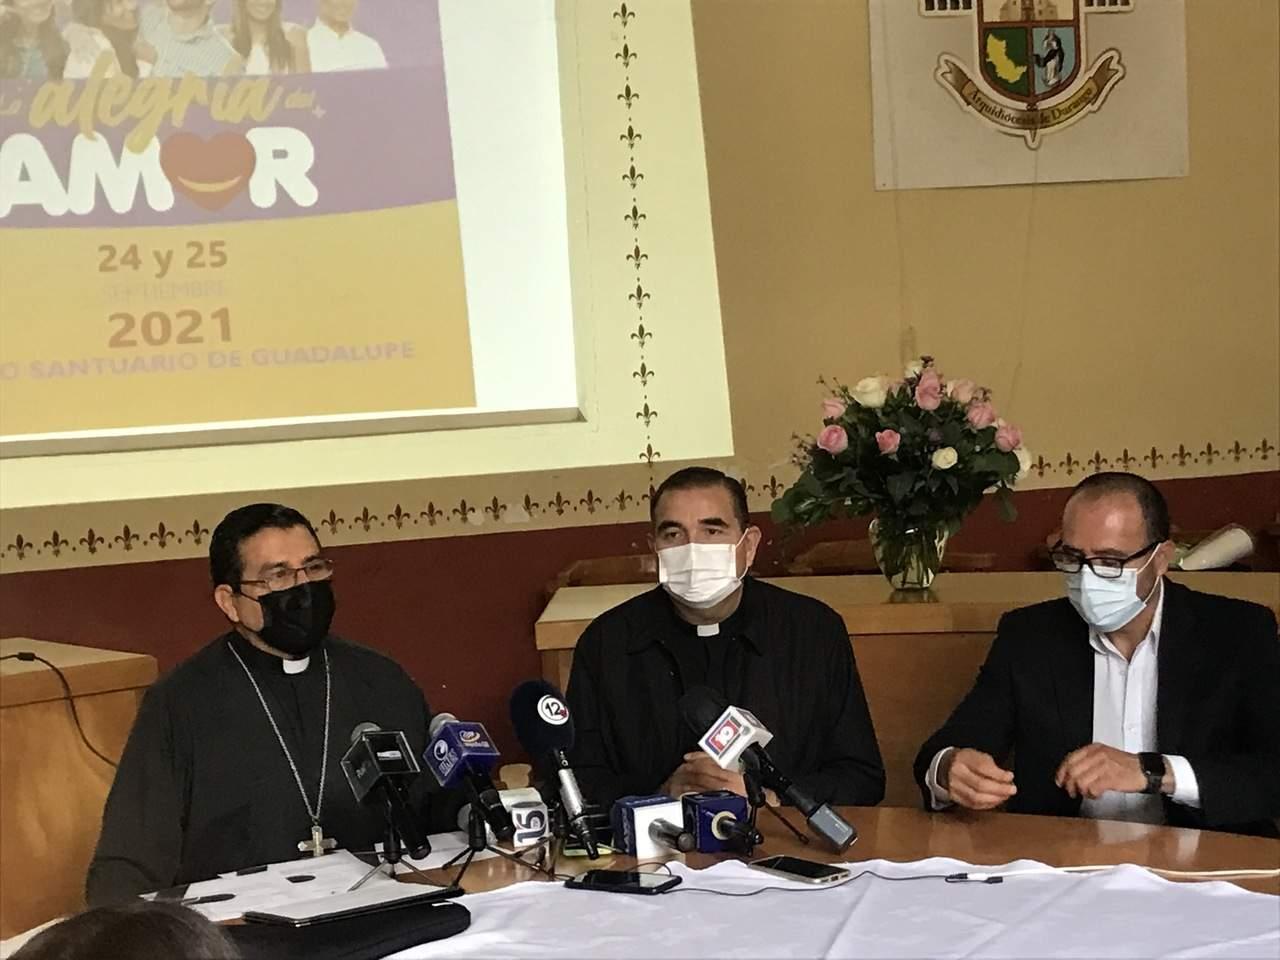 Aborto es asesinato, dice Iglesia católica en Durango